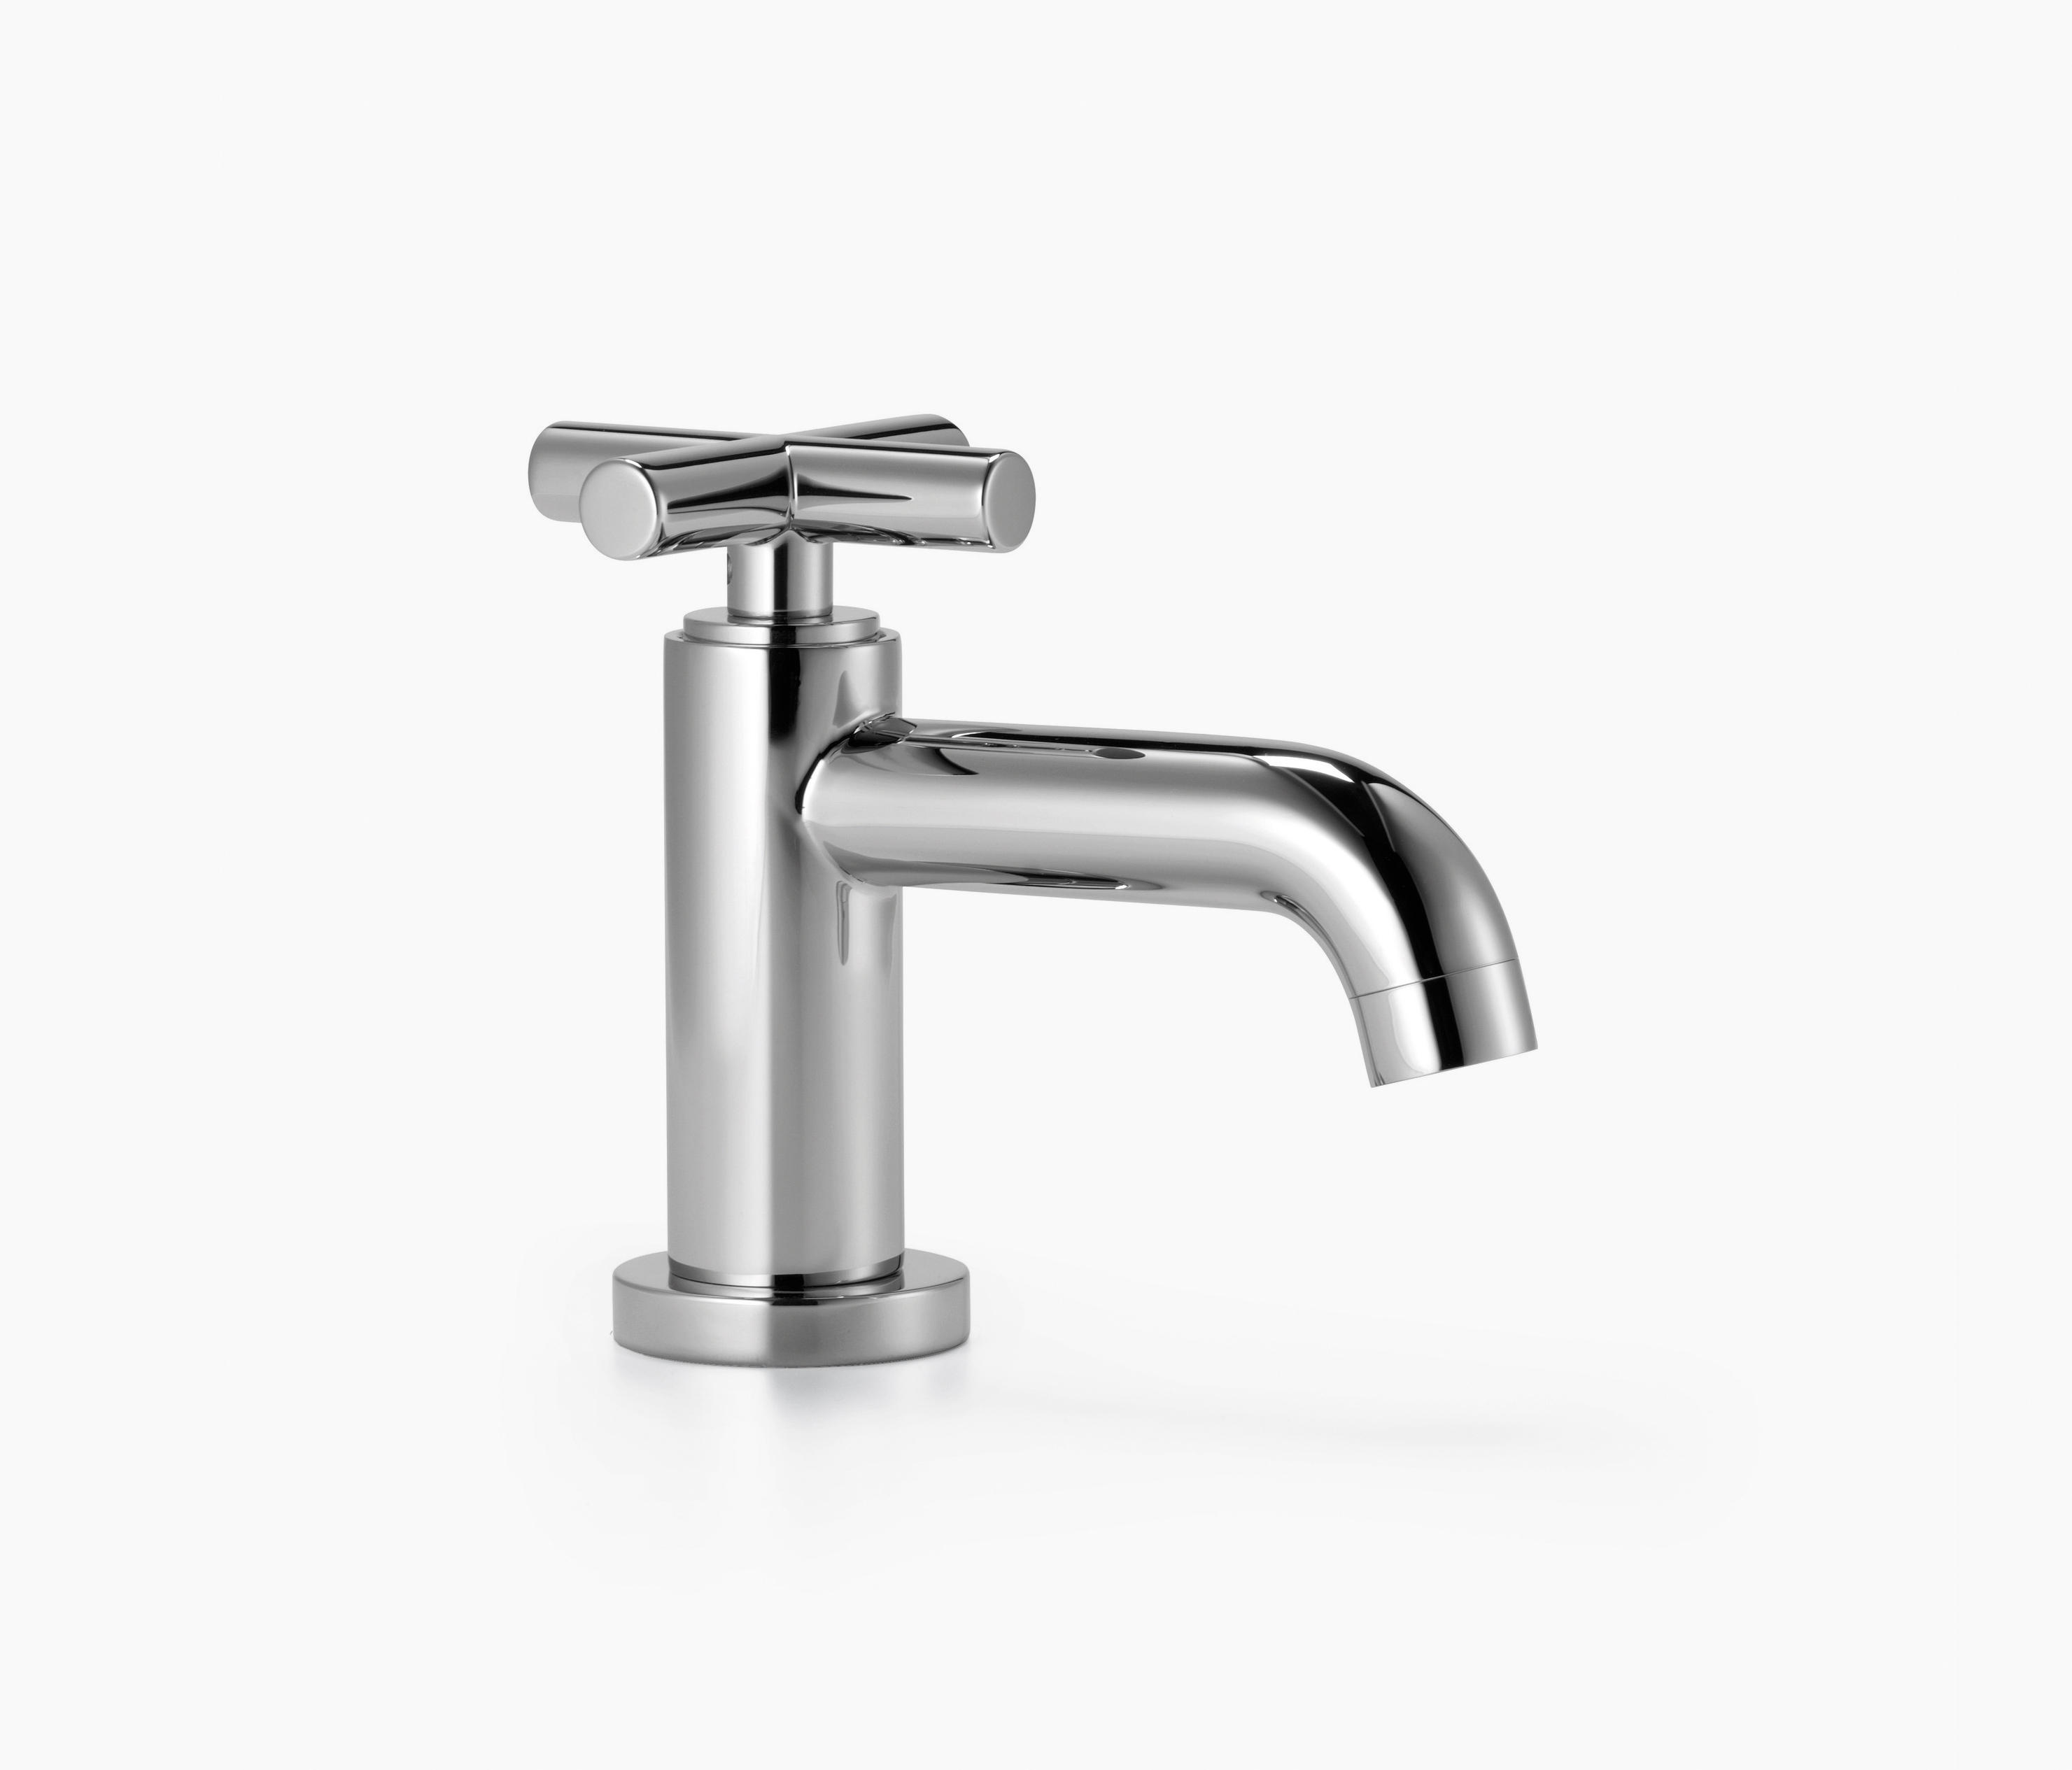 tara rubinetto lavabo rubinetteria per lavabi dornbracht architonic. Black Bedroom Furniture Sets. Home Design Ideas